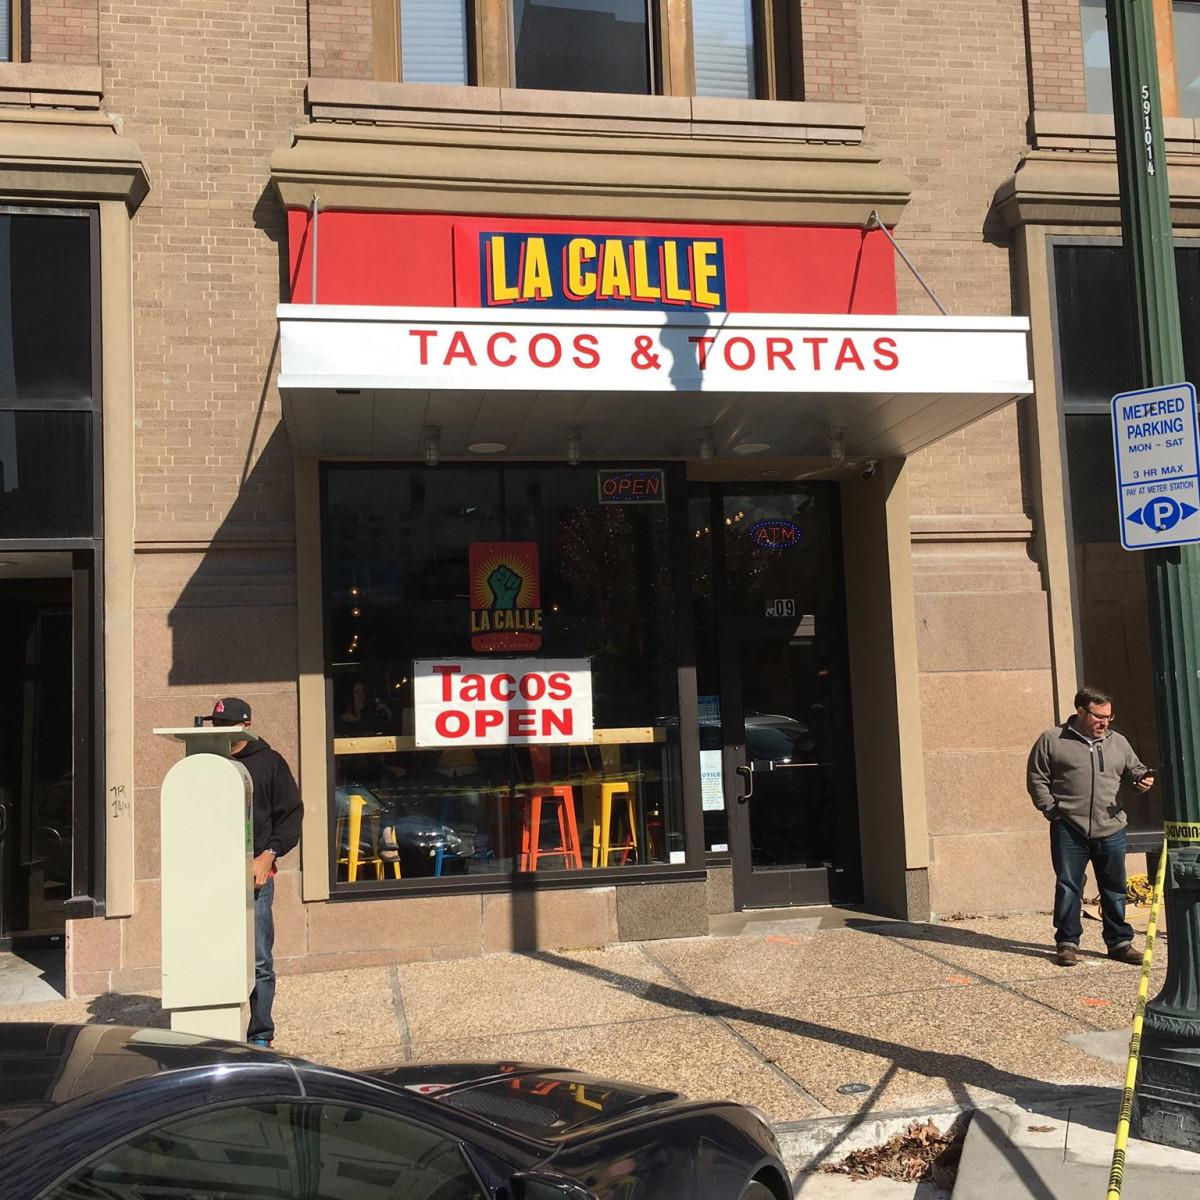 La Calle Tacos exterior